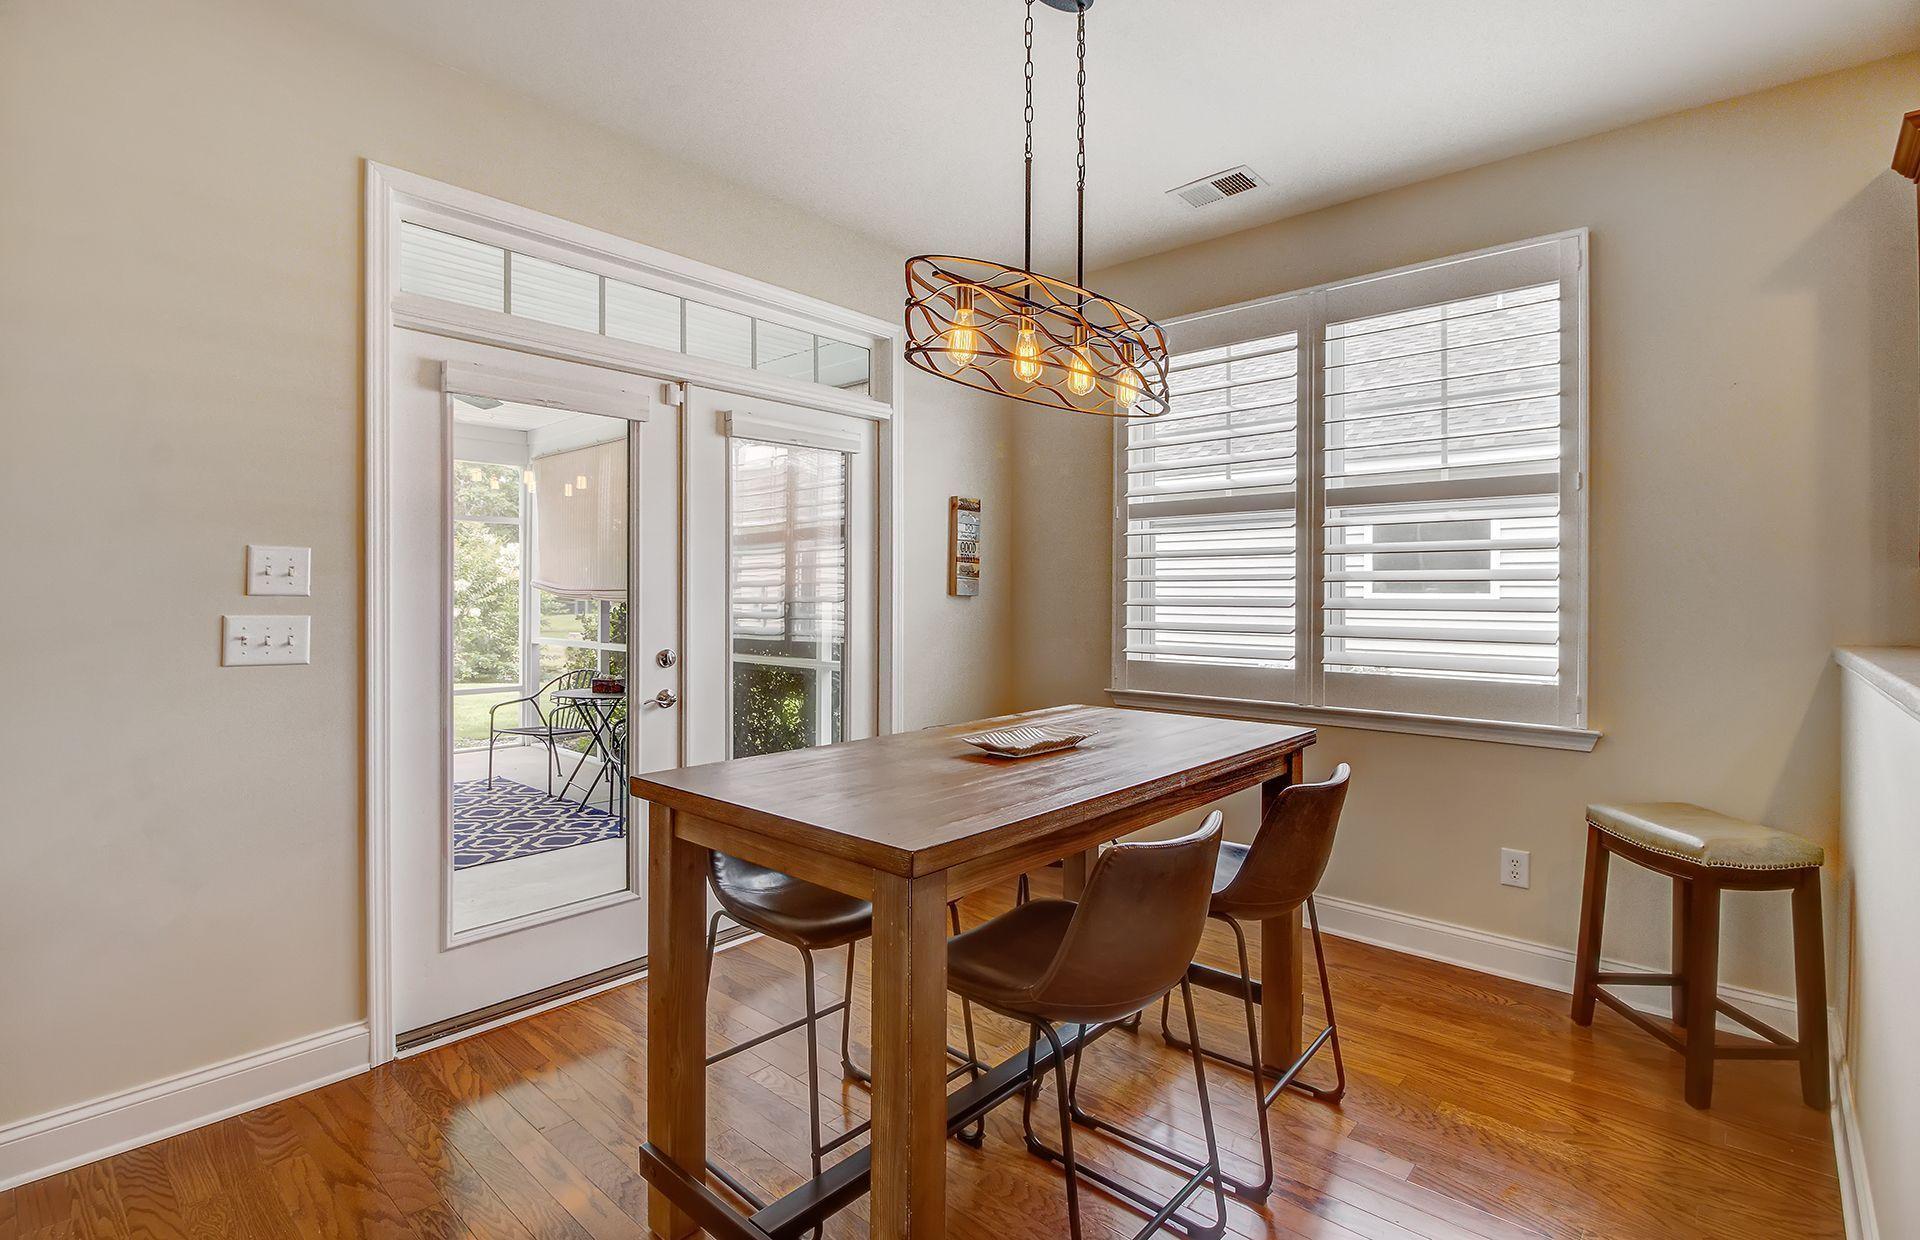 Linnen Place Homes For Sale - 1275 Shingleback, Mount Pleasant, SC - 30